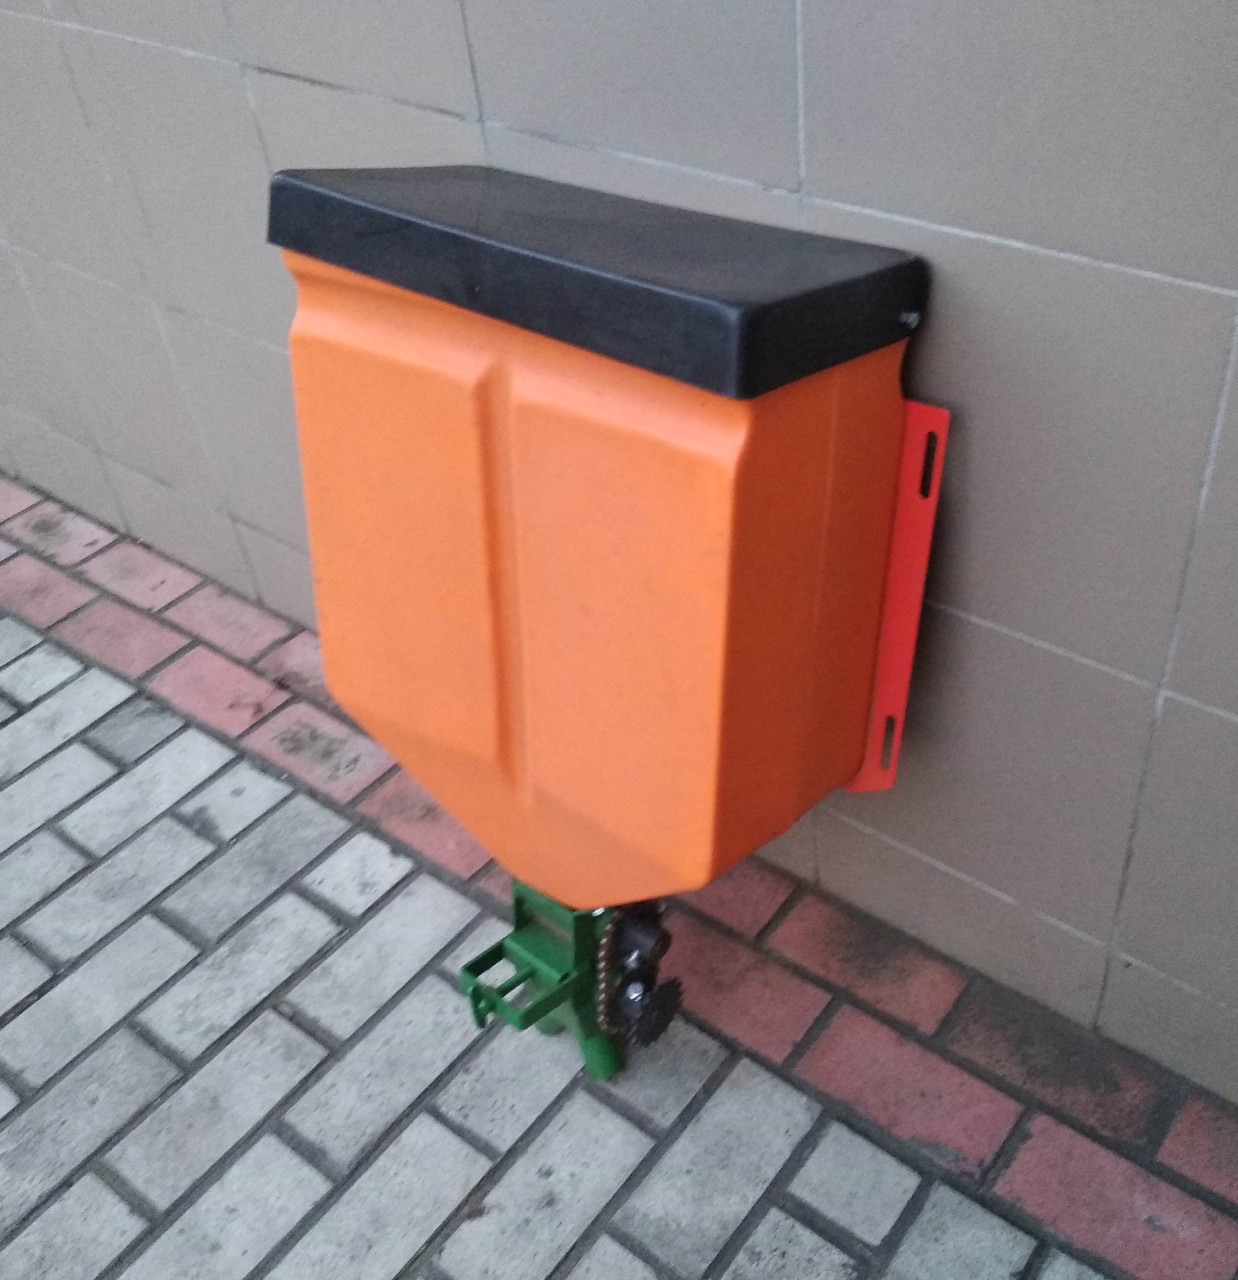 Бак для удобрений к сажалке S-239 с регулятором подачи (Польша, Bomet)